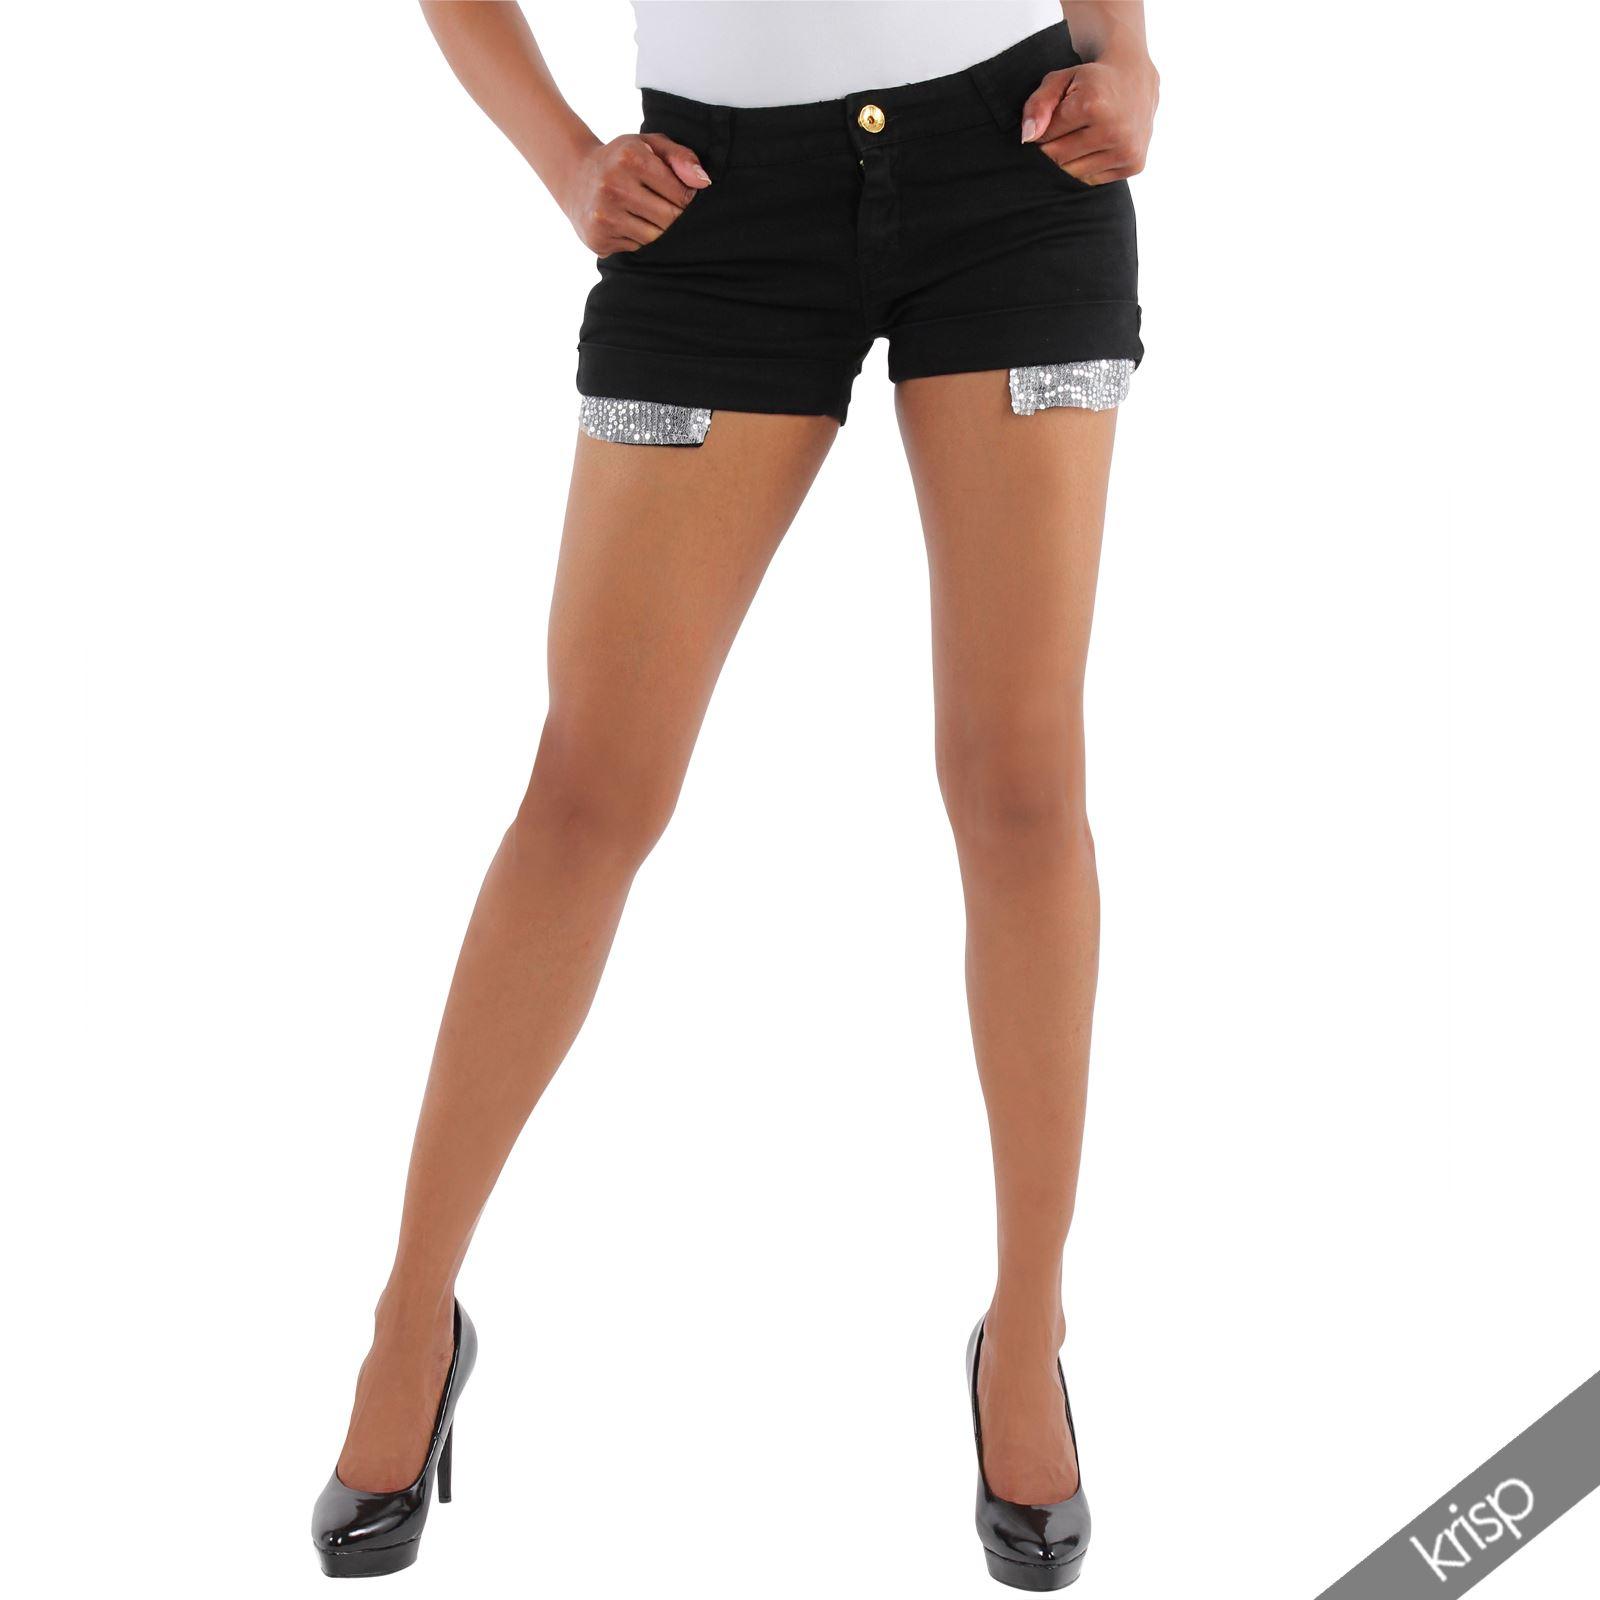 damen shorts kurze hose mit pailletten stretch hot pants pantys farbige jeans ebay. Black Bedroom Furniture Sets. Home Design Ideas